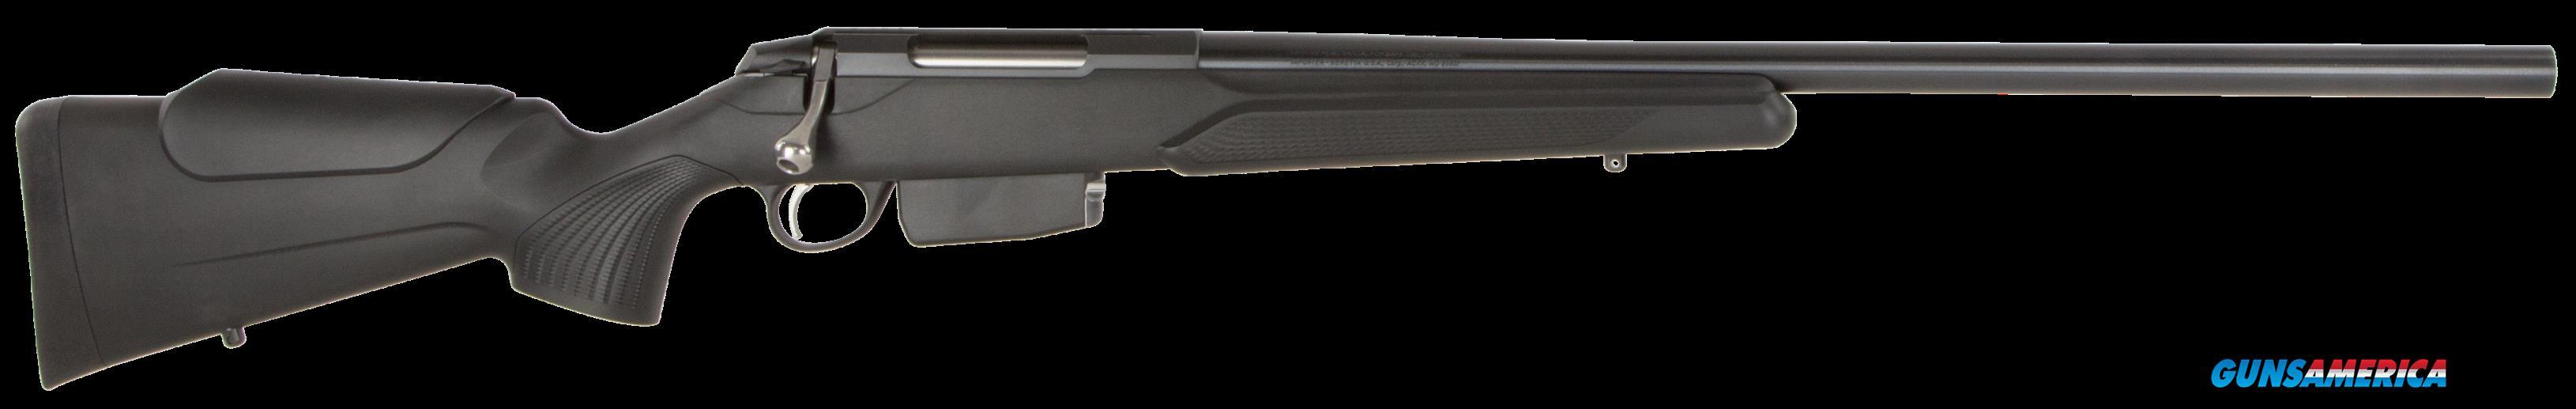 Tikka T3 T3x, Tikka Jrtxh314    T3x Var   22250  Guns > Pistols > 1911 Pistol Copies (non-Colt)